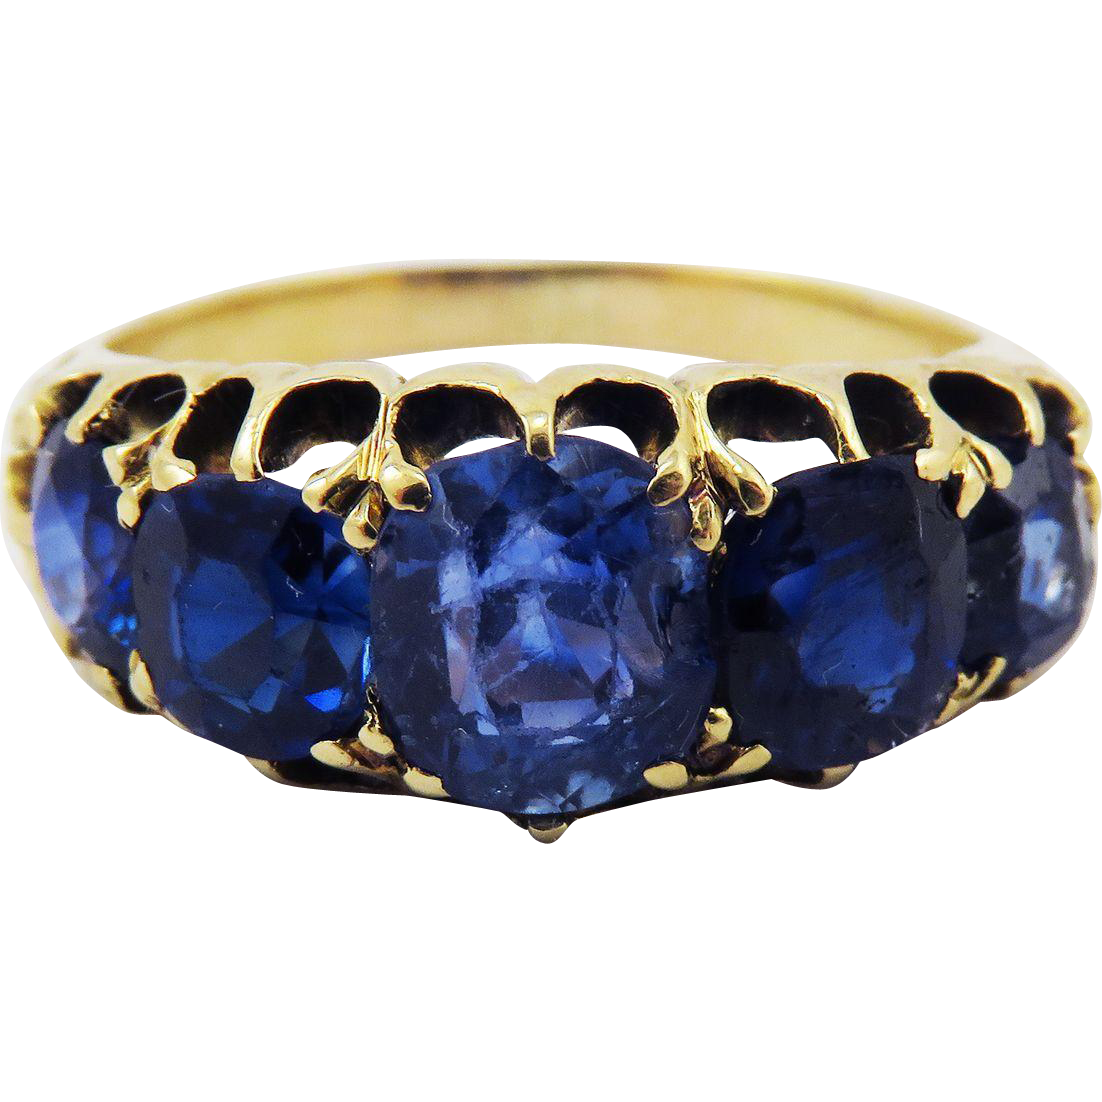 SO DREAMY Victorian 4.59 Ct. TW 5-Stone Unheated Ceylon Sapphire/18k Ring, c.1890!